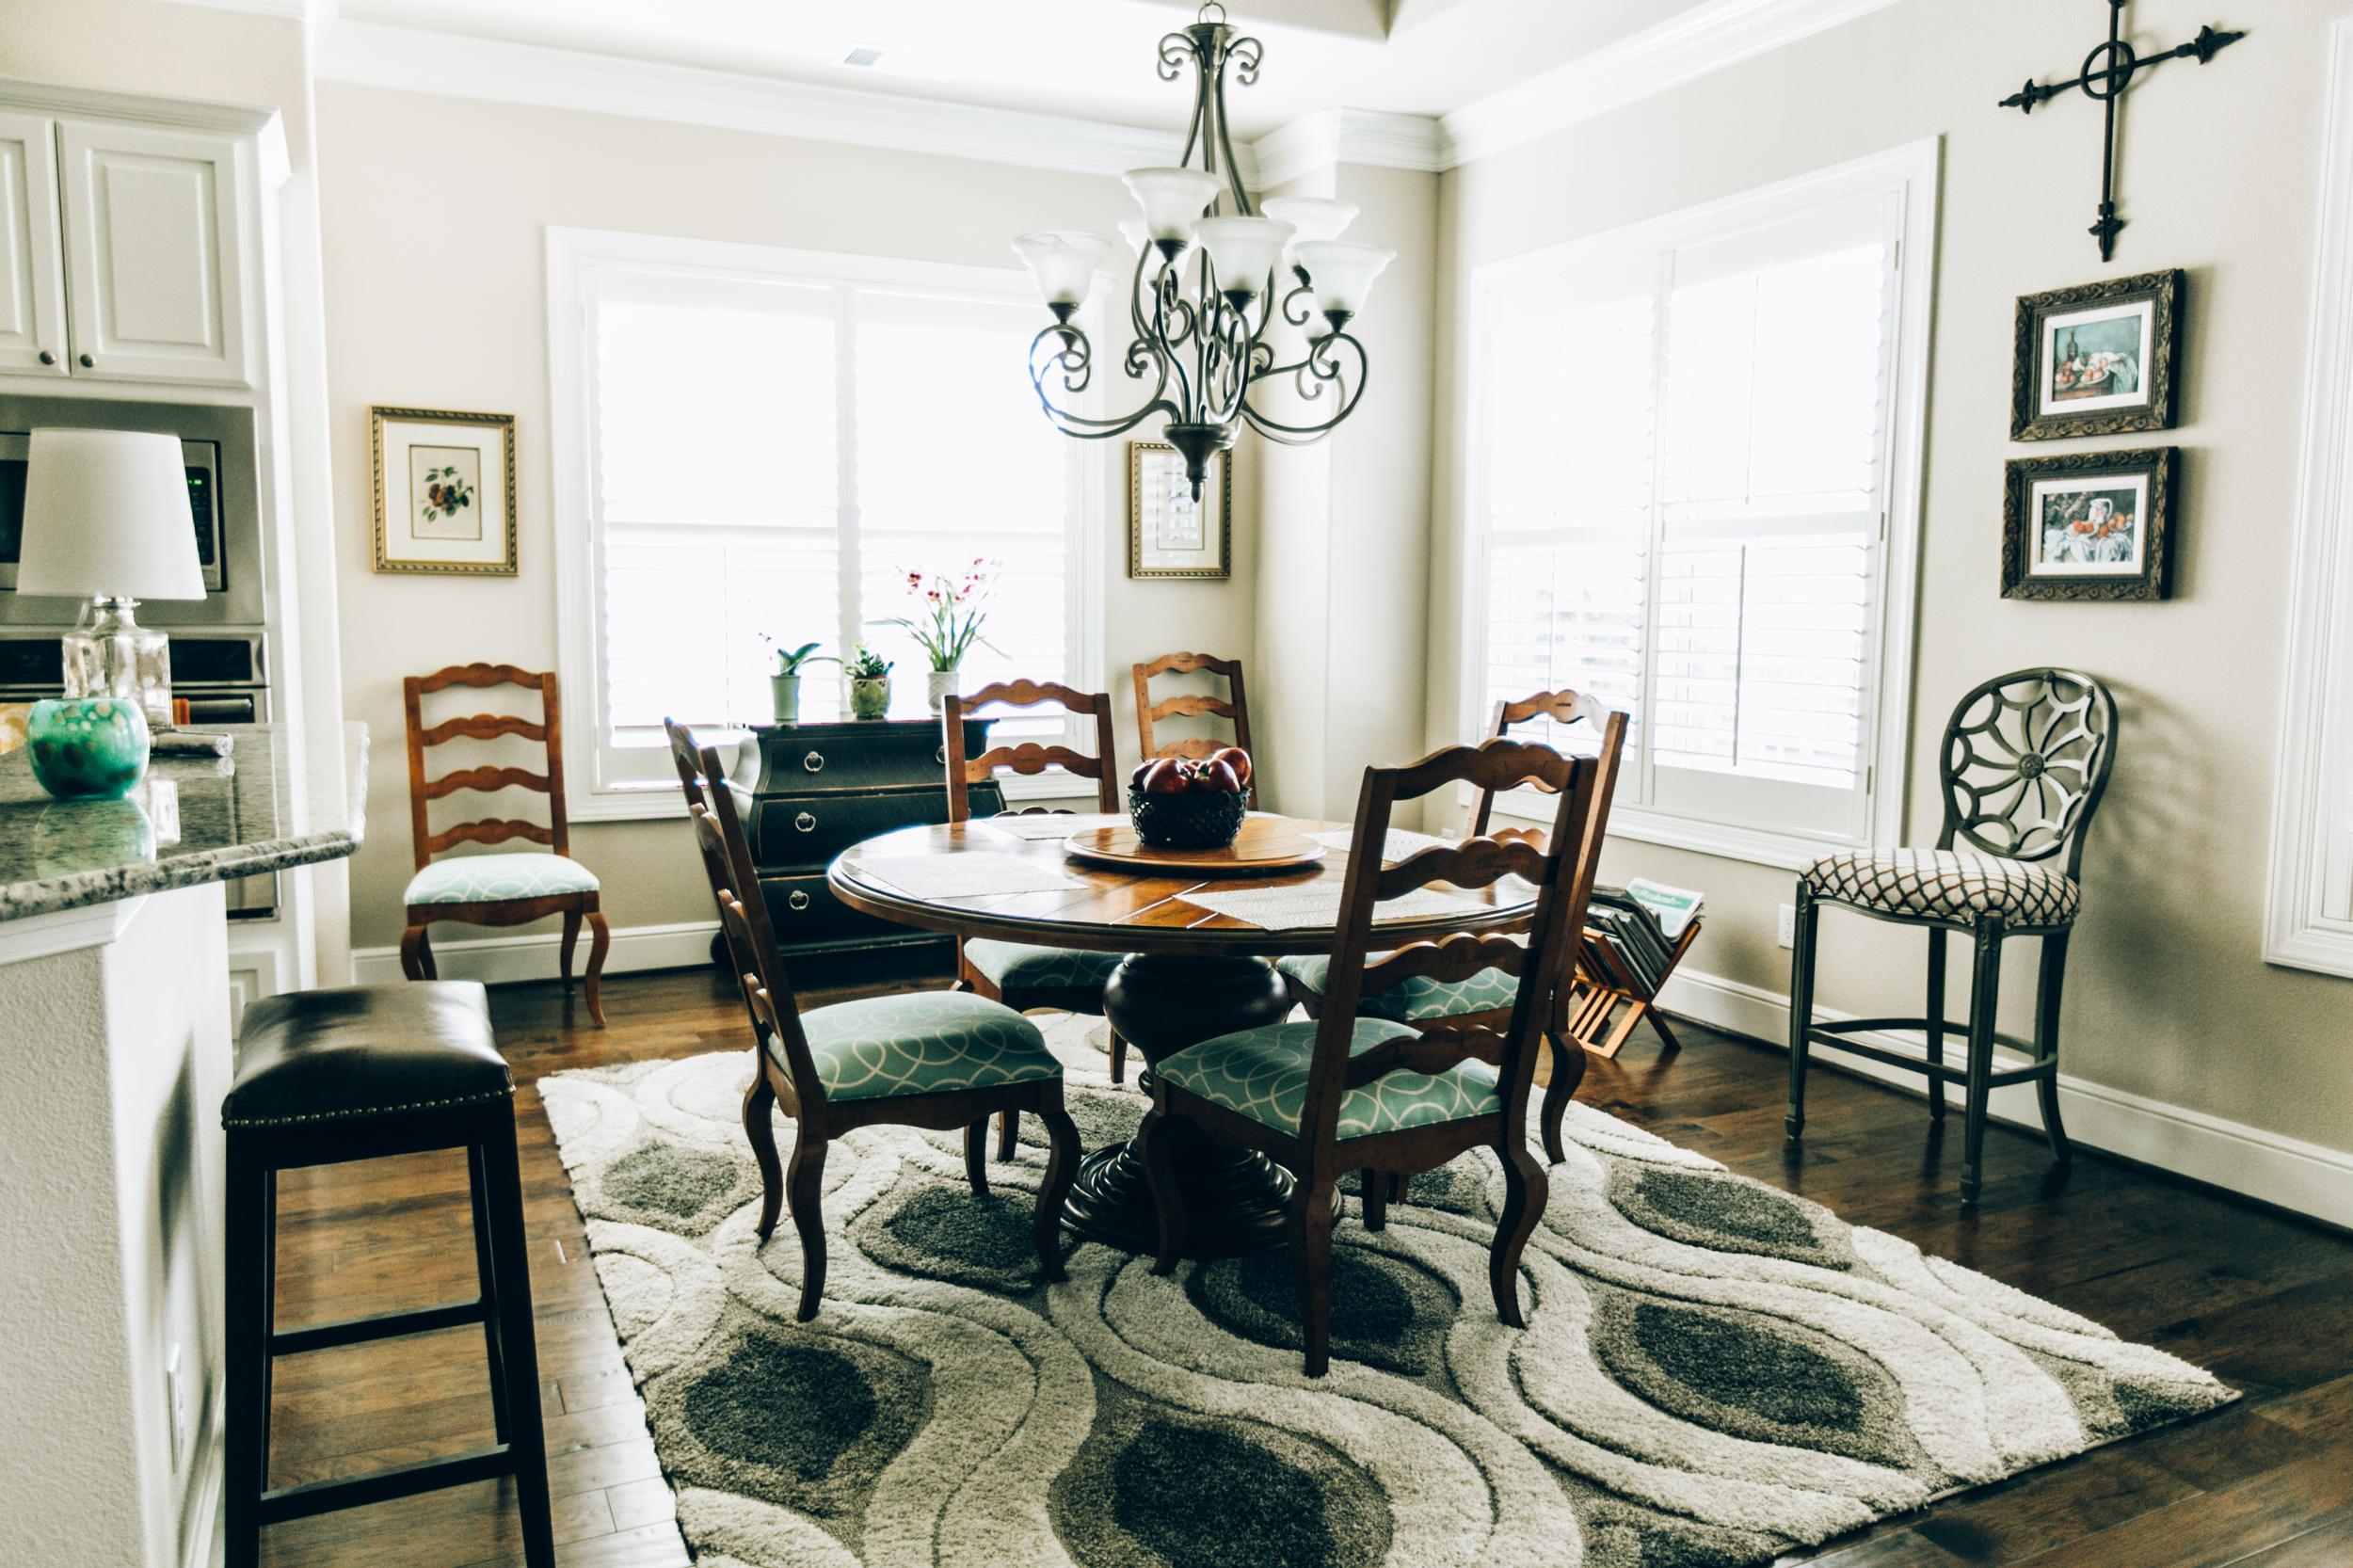 interior-design-home-decorating-327.jpg